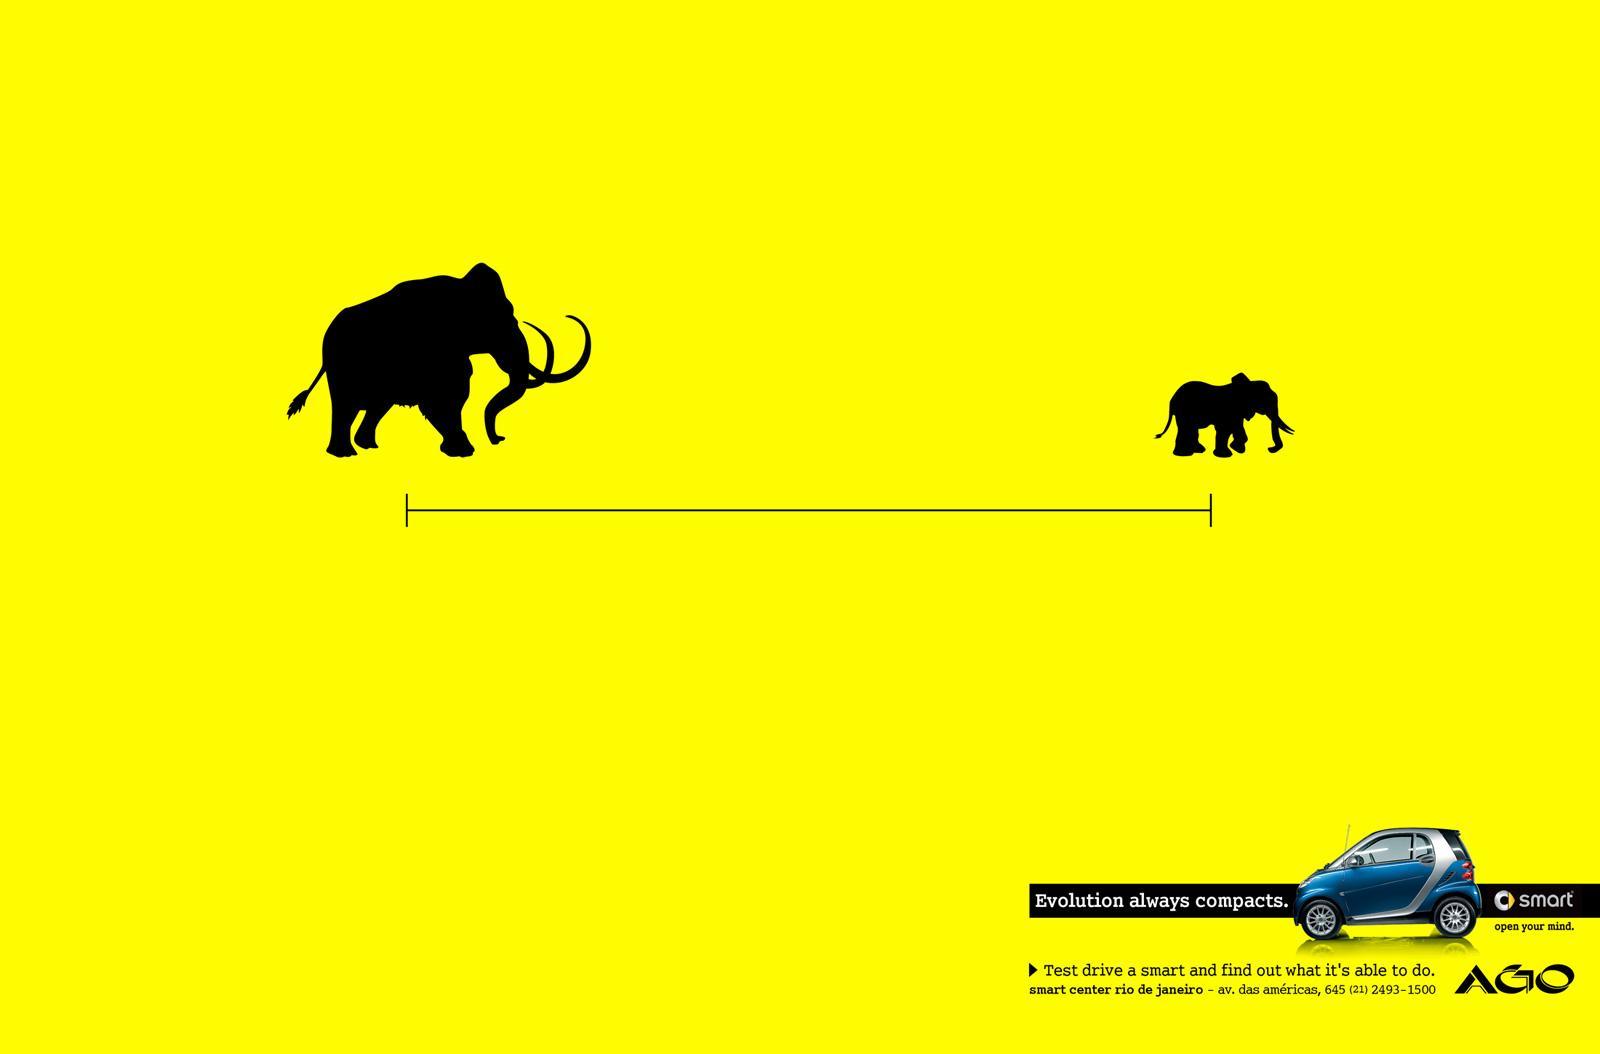 Smart Print Ad -  Evolution always compacts, Mastodon